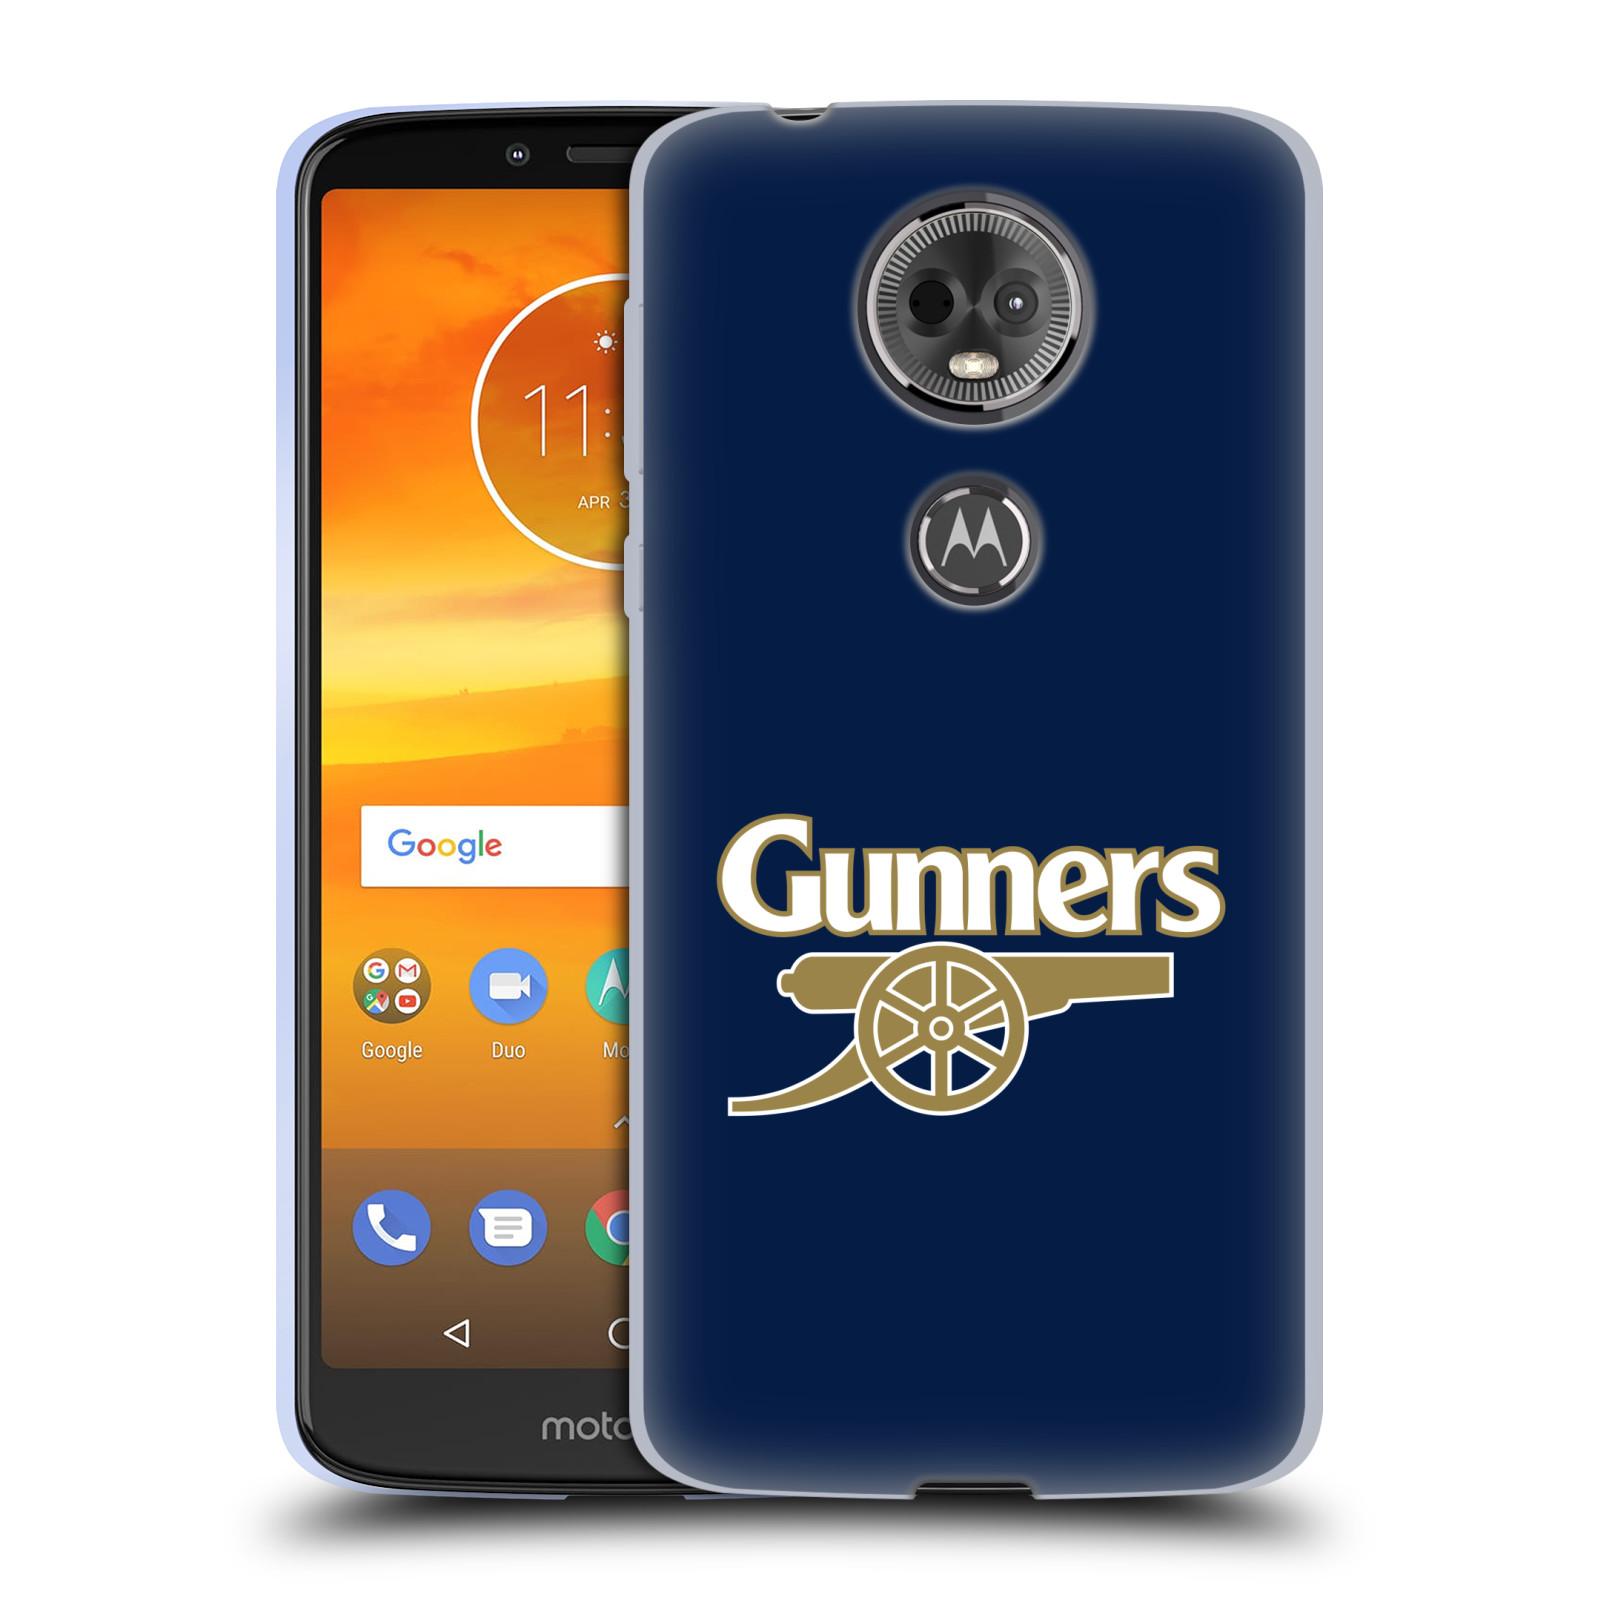 Silikonové pouzdro na mobil Motorola Moto E5 Plus - Head Case - Arsenal FC - Gunners